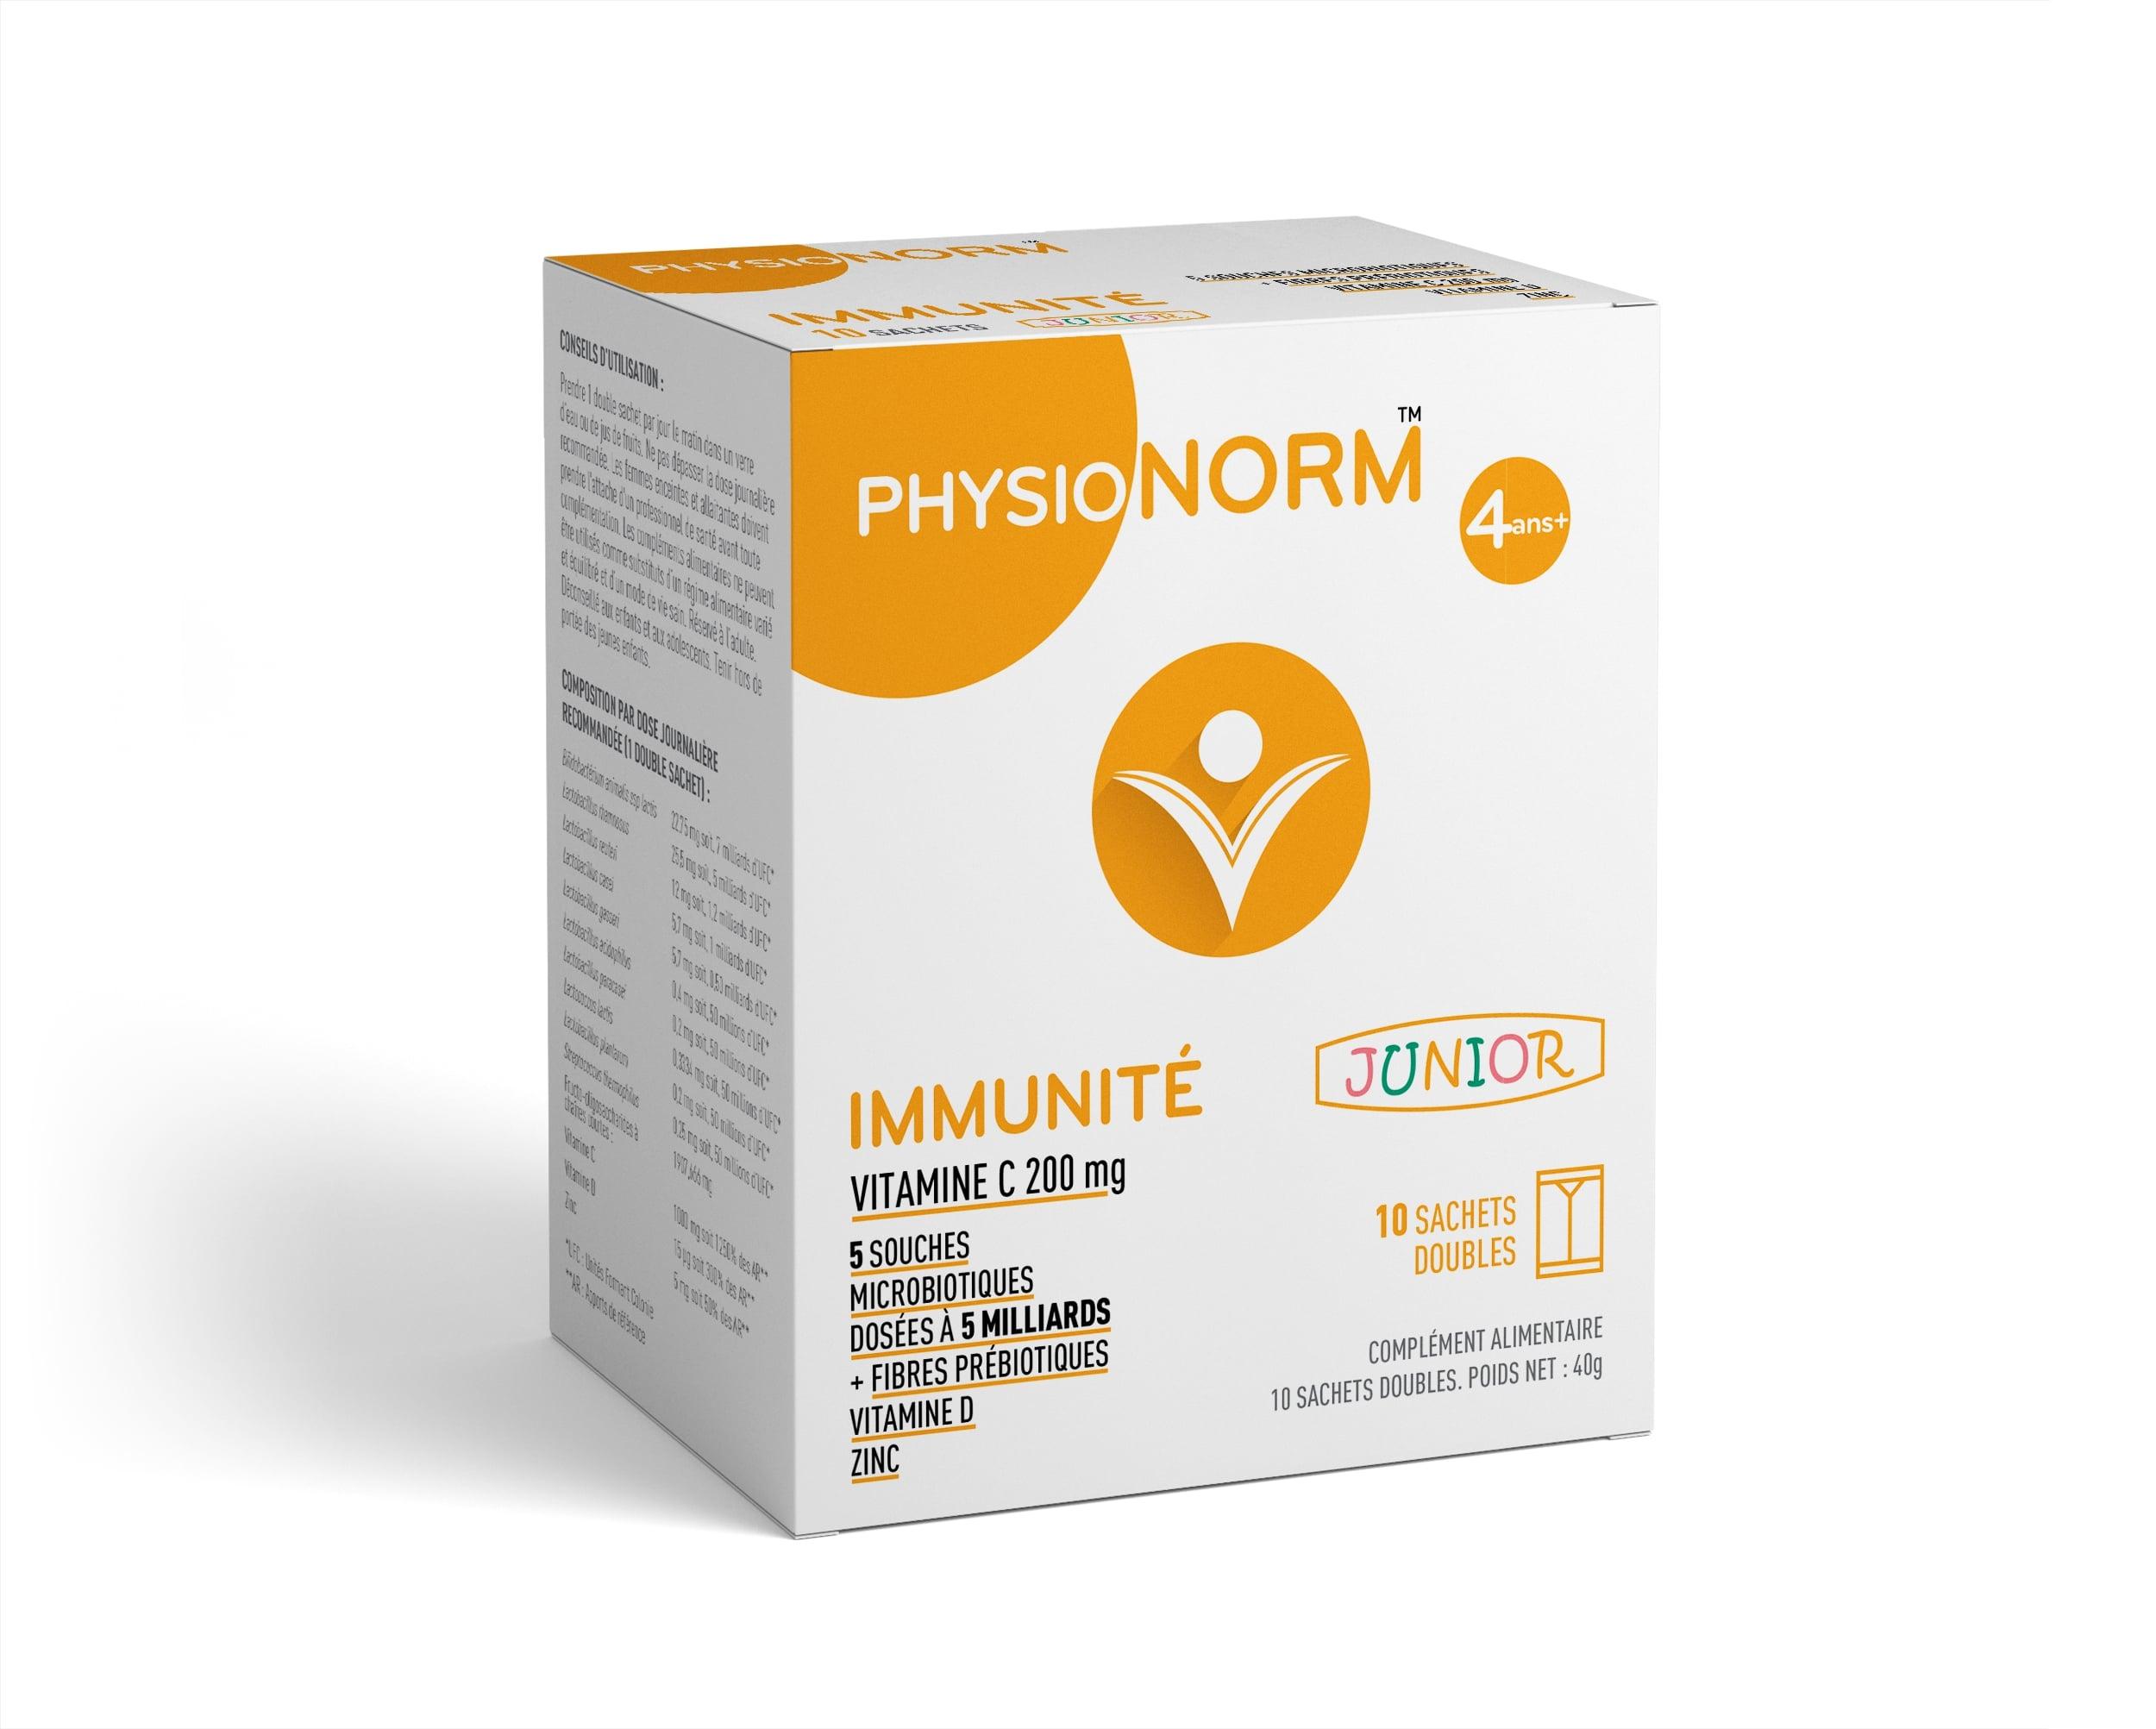 Laboratoire-Immubio-complement-alimentaire-PhysioNorm-IMMUNITE-Junior